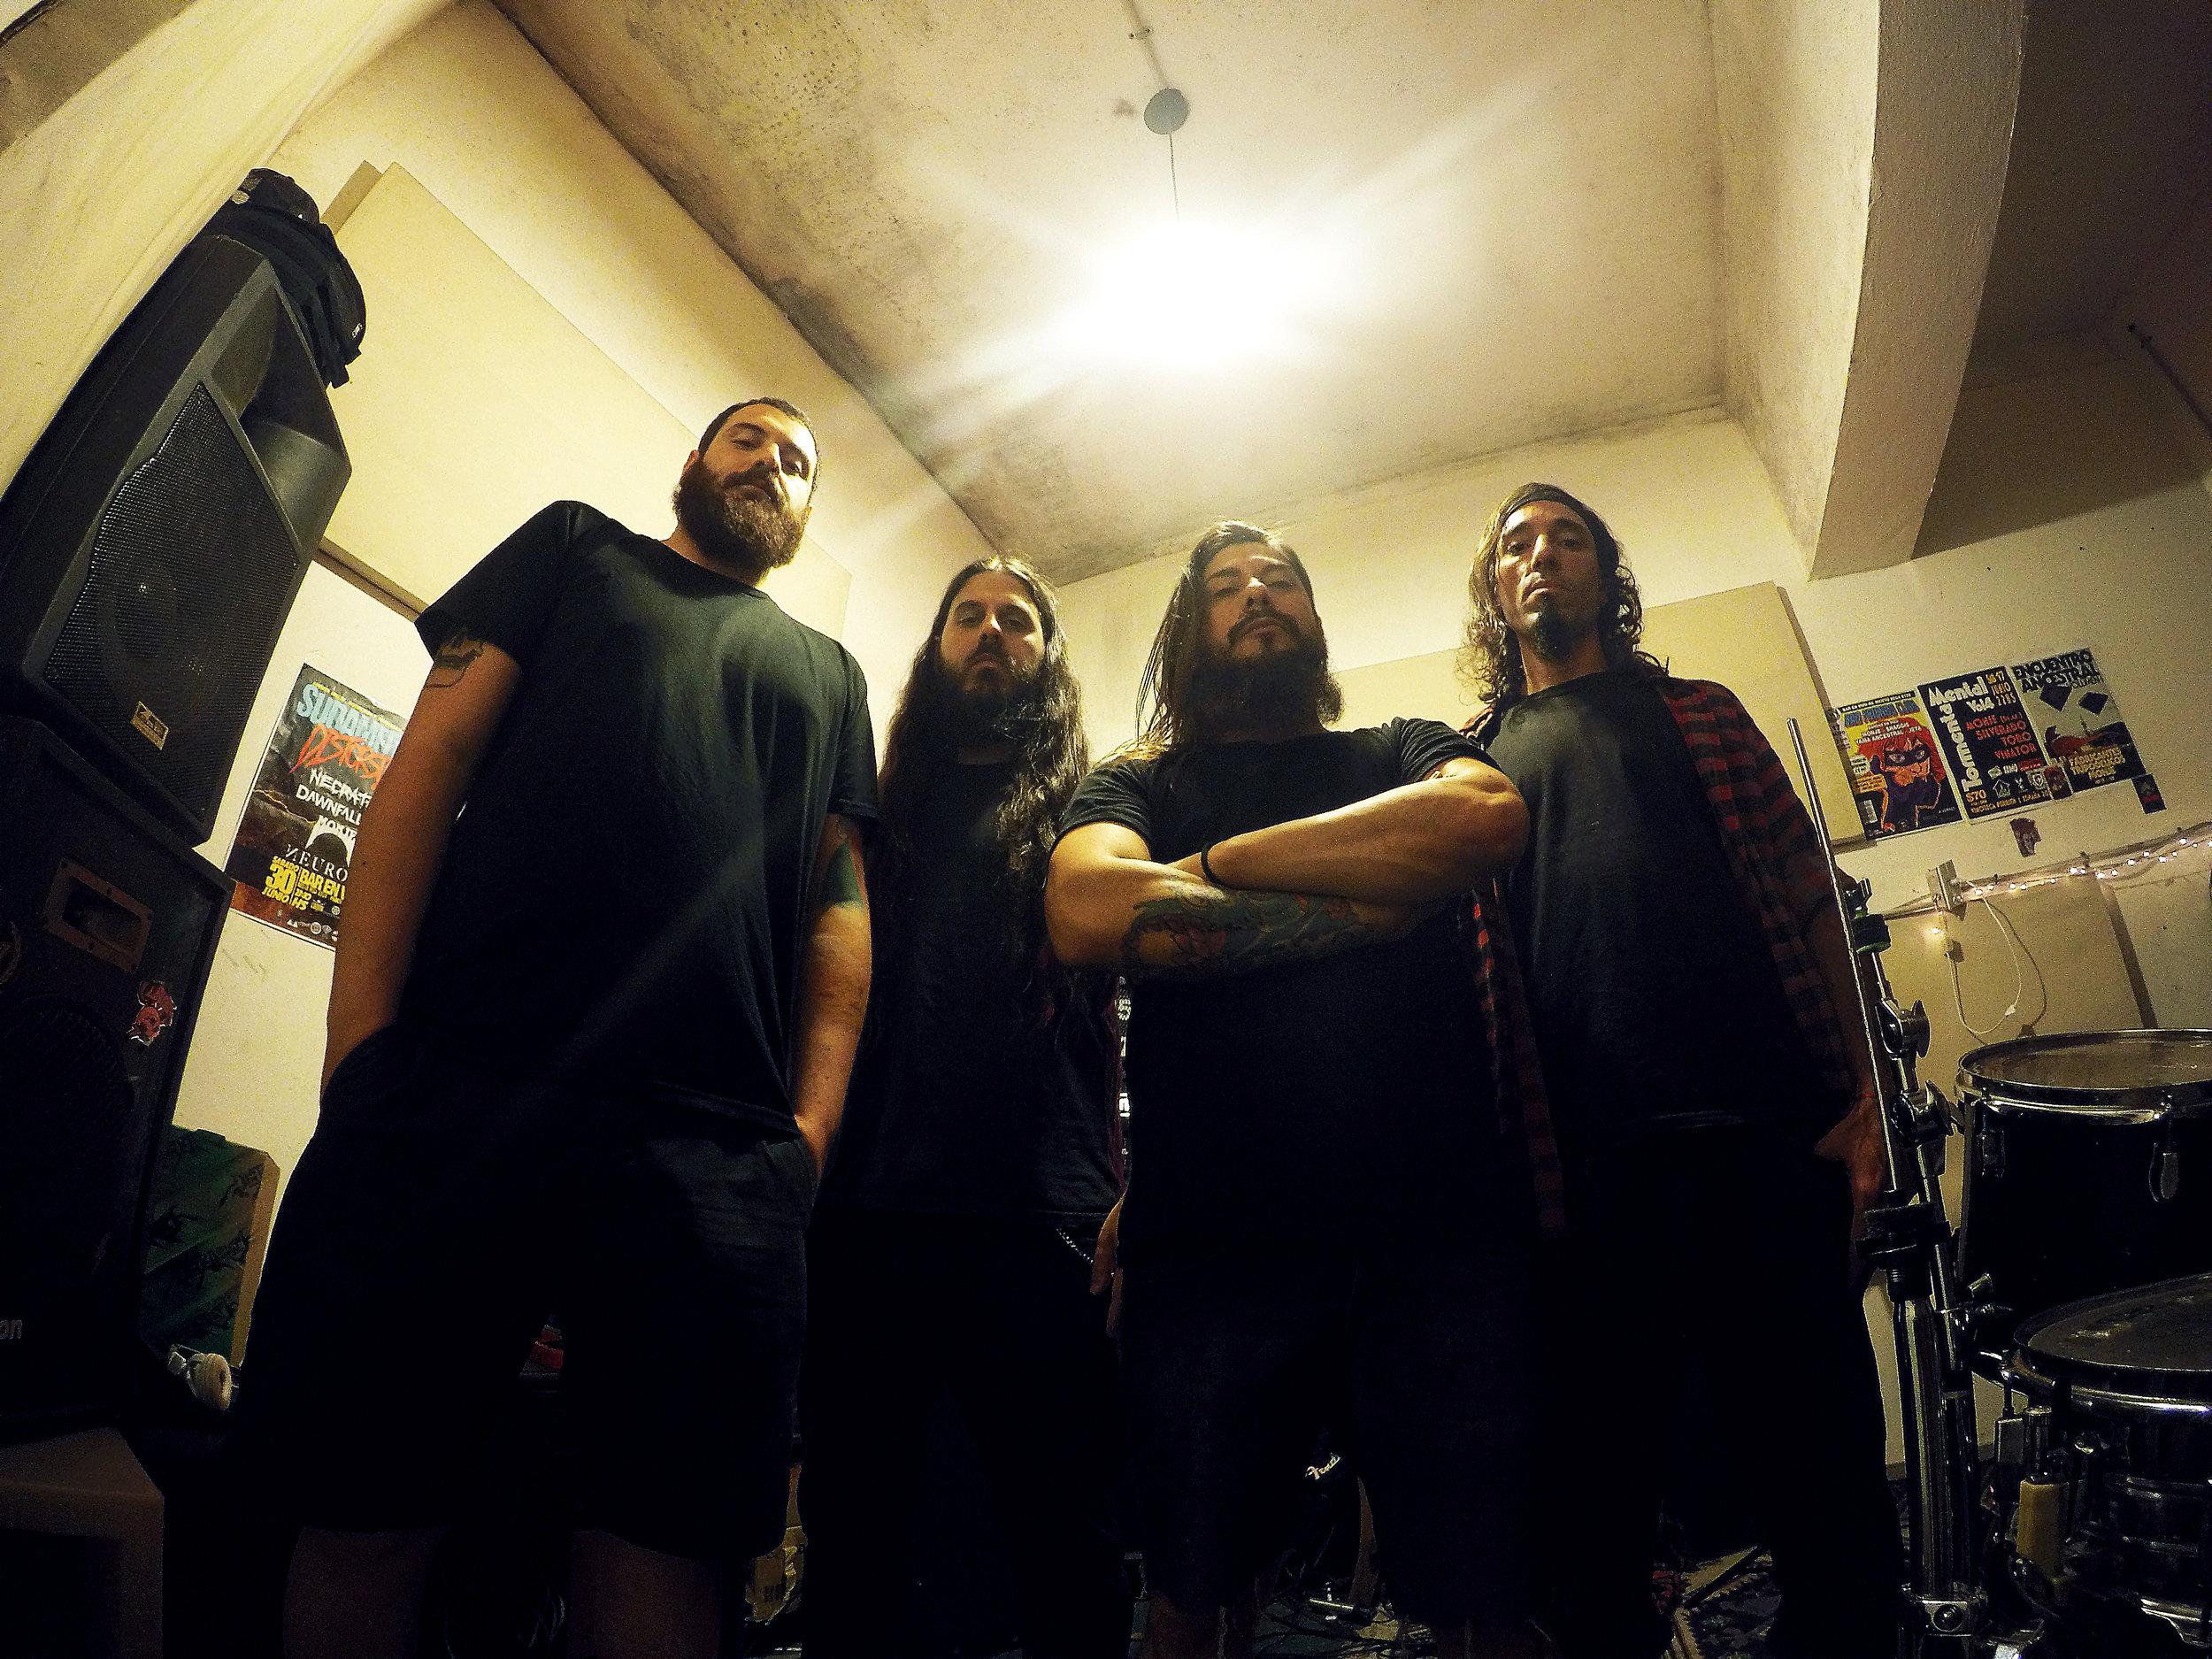 SEBASTIAN ROLÓN (vocals), DANIEL IRANZO (drums), GUIDO SOLDINI (bass), DIEGO PETULLO (guitar)